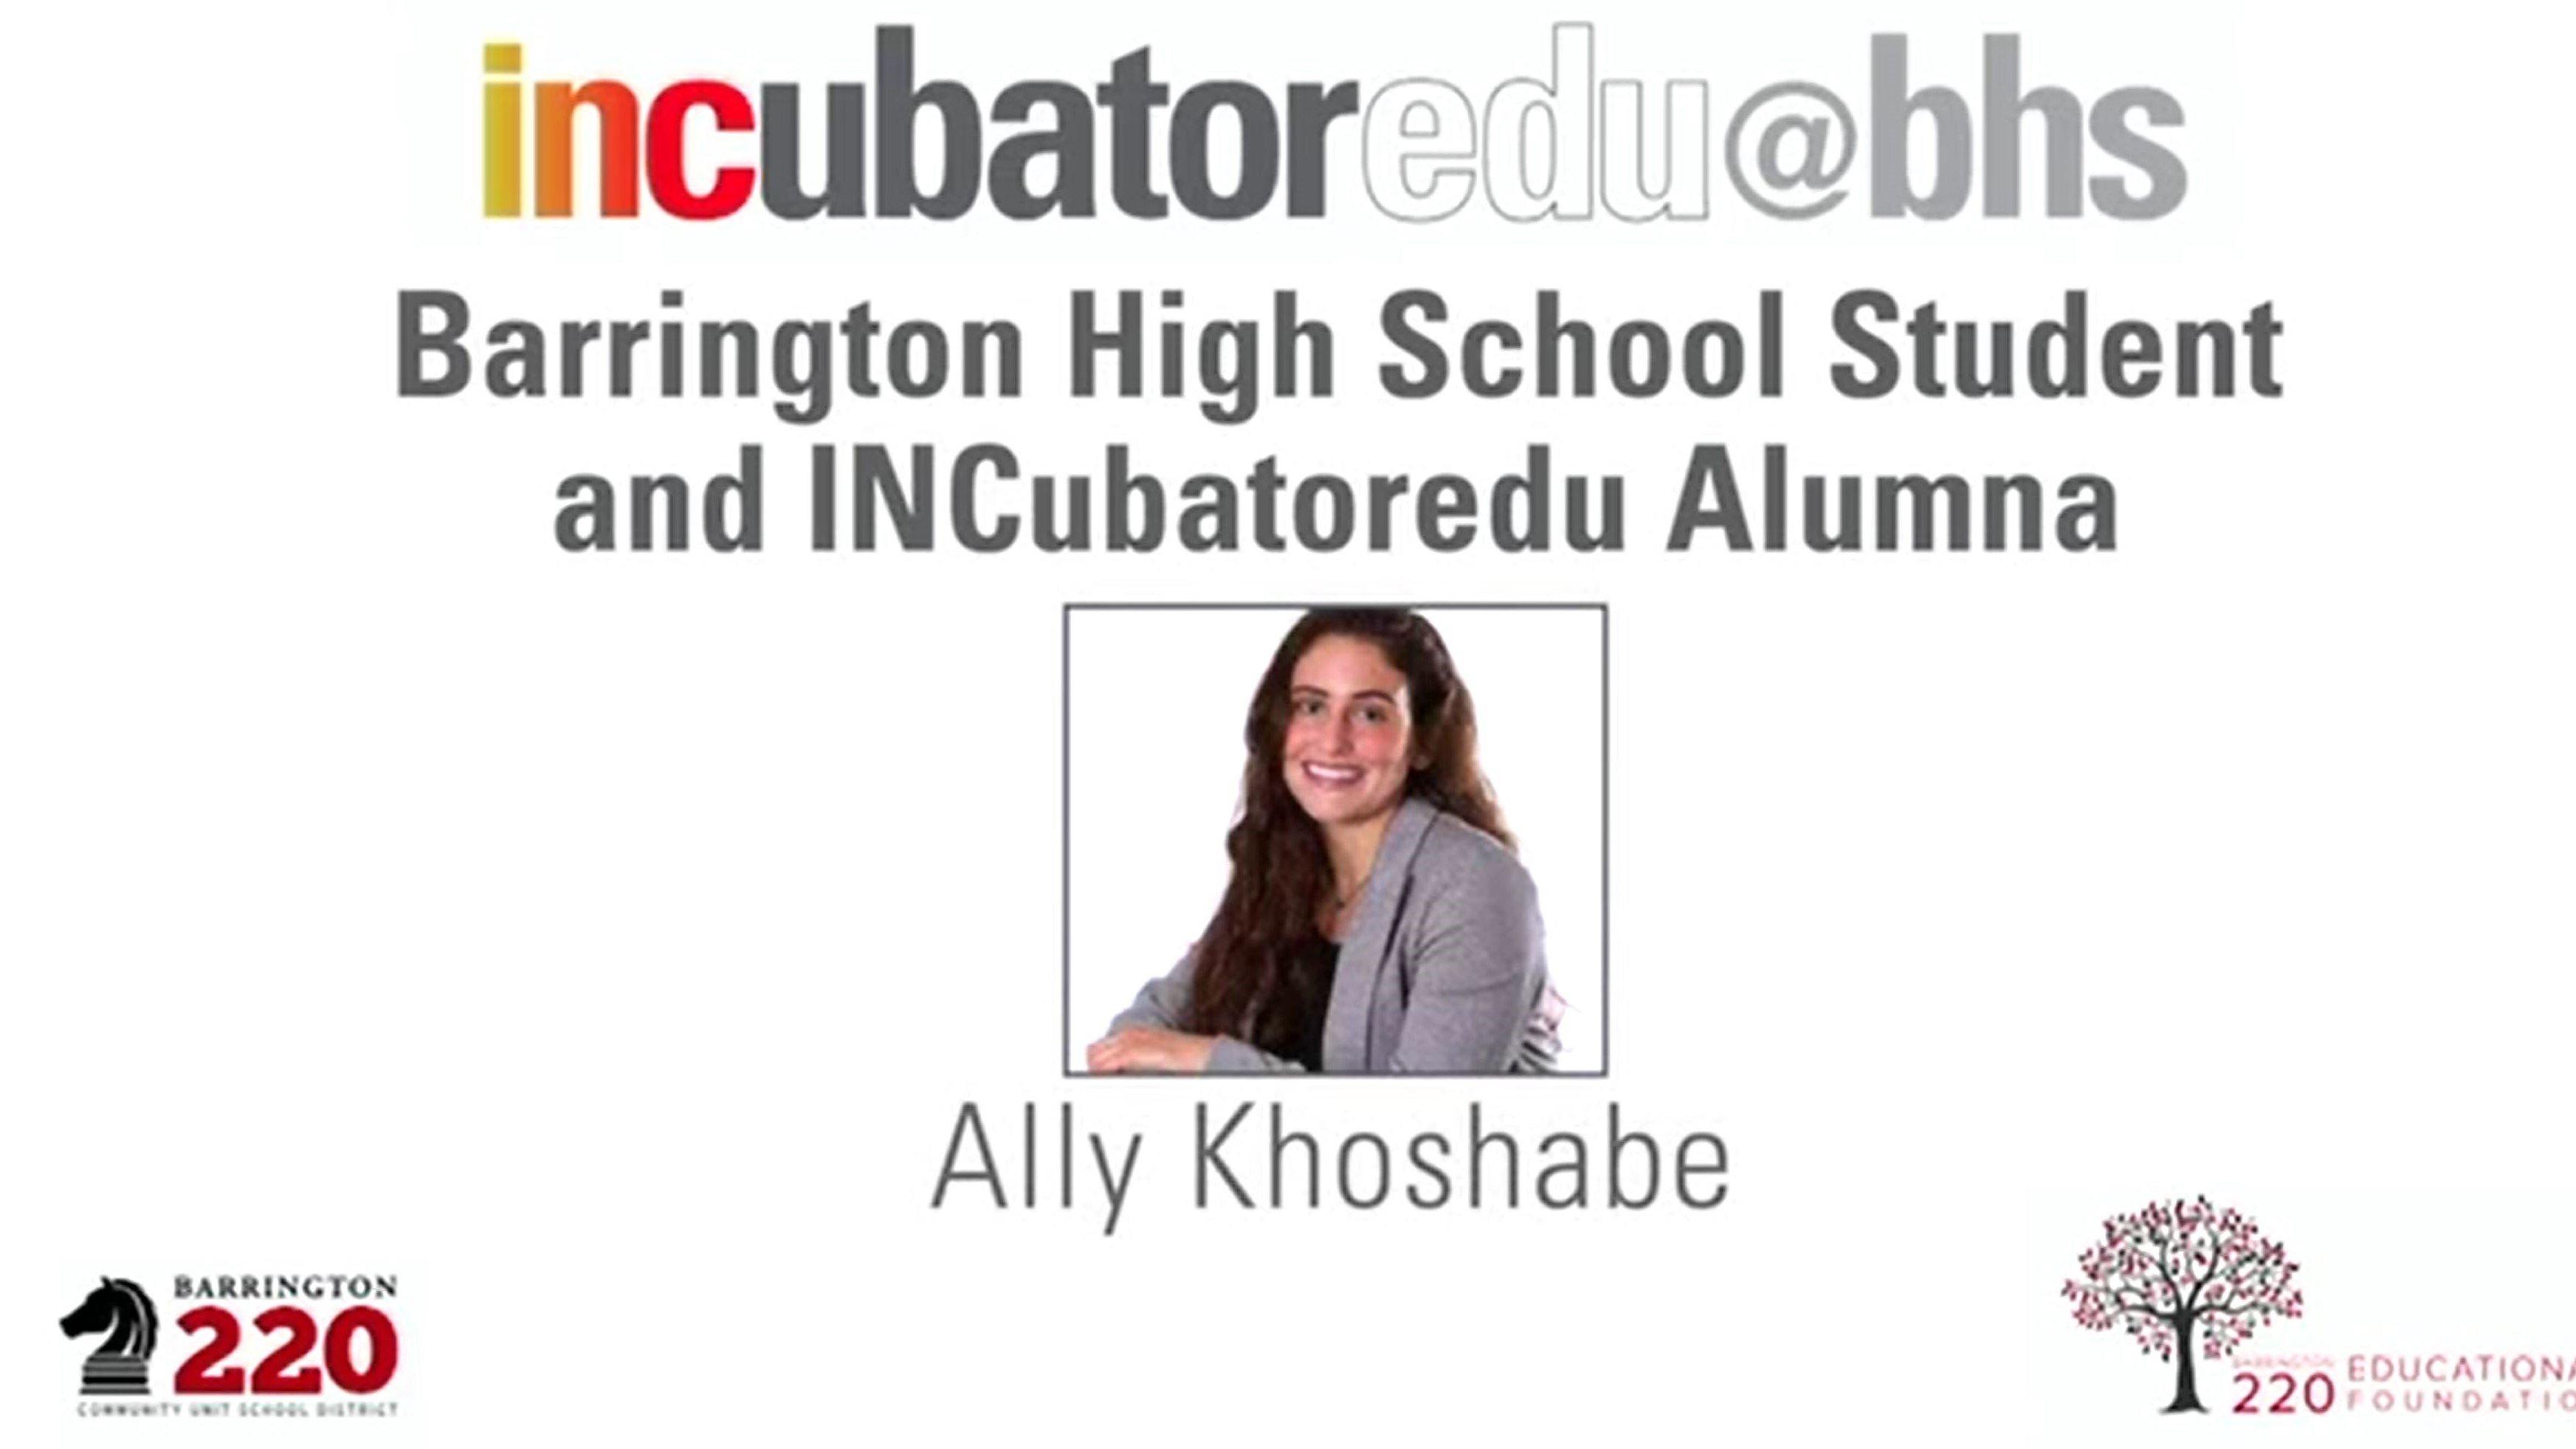 'My Experience with INCubatoredu' — 3-Minute Student Testimonial